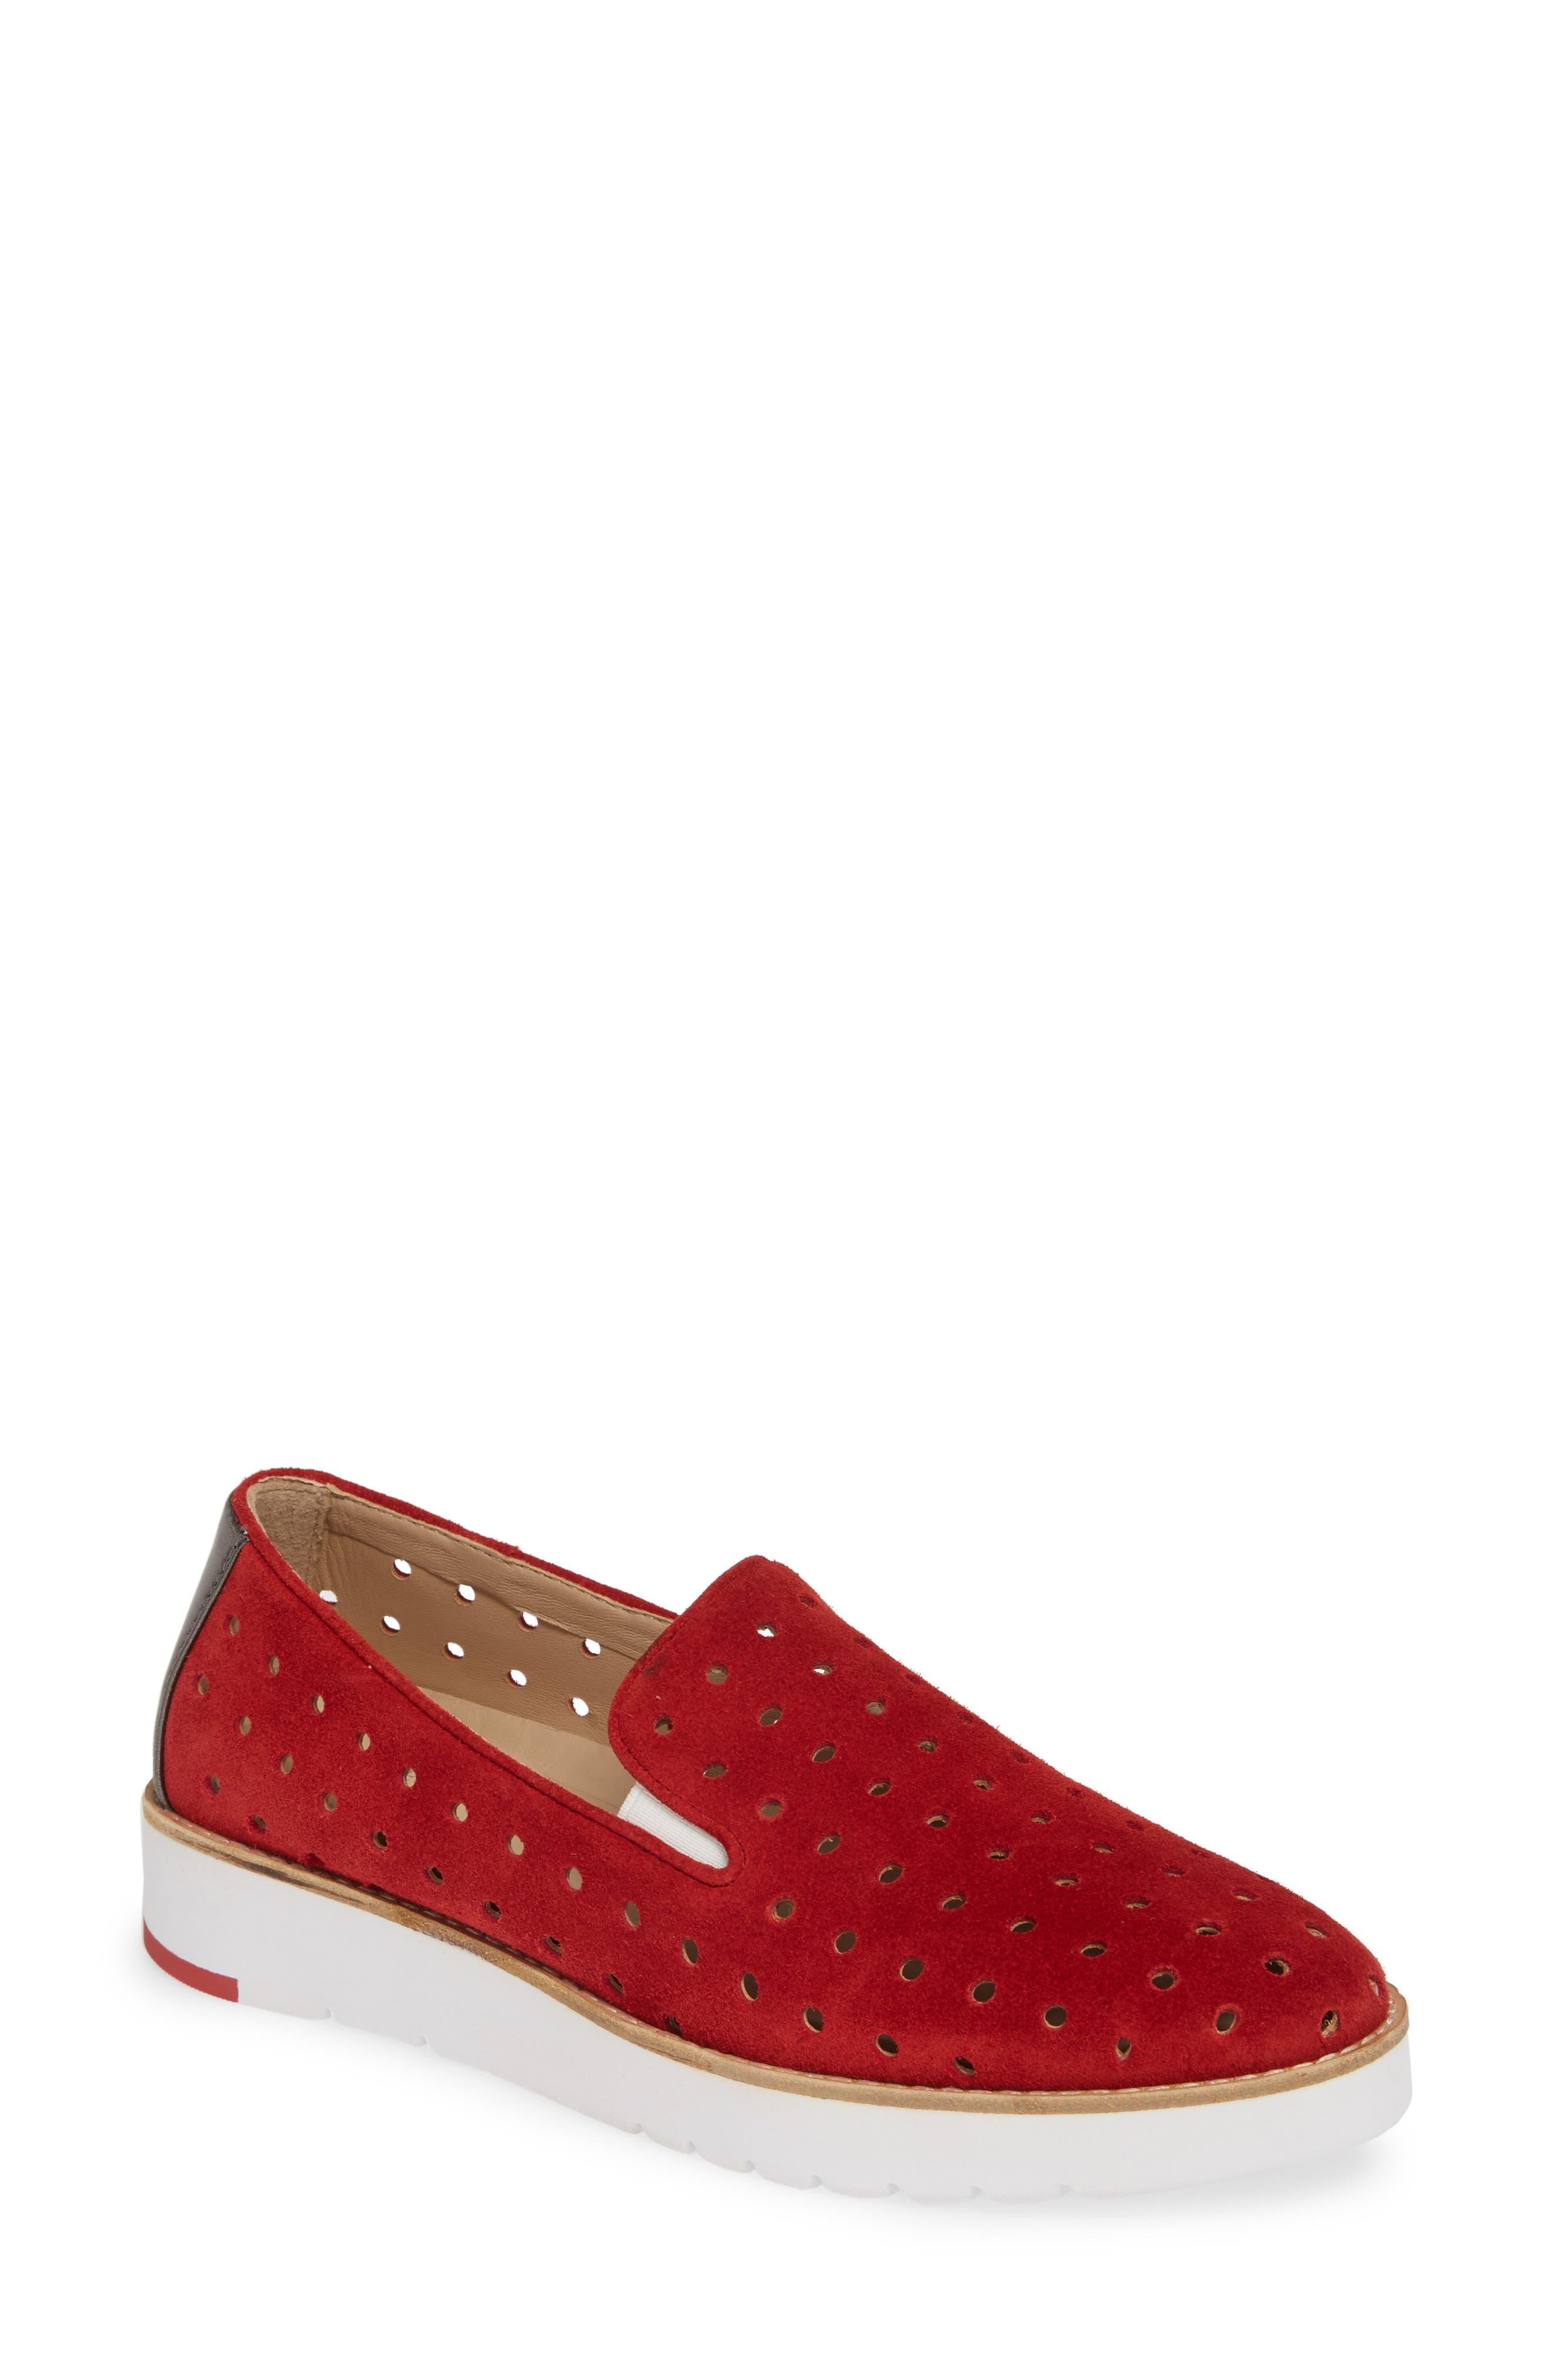 Johnston & Murphy Penelope Perforated Slip-On Sneaker, Red